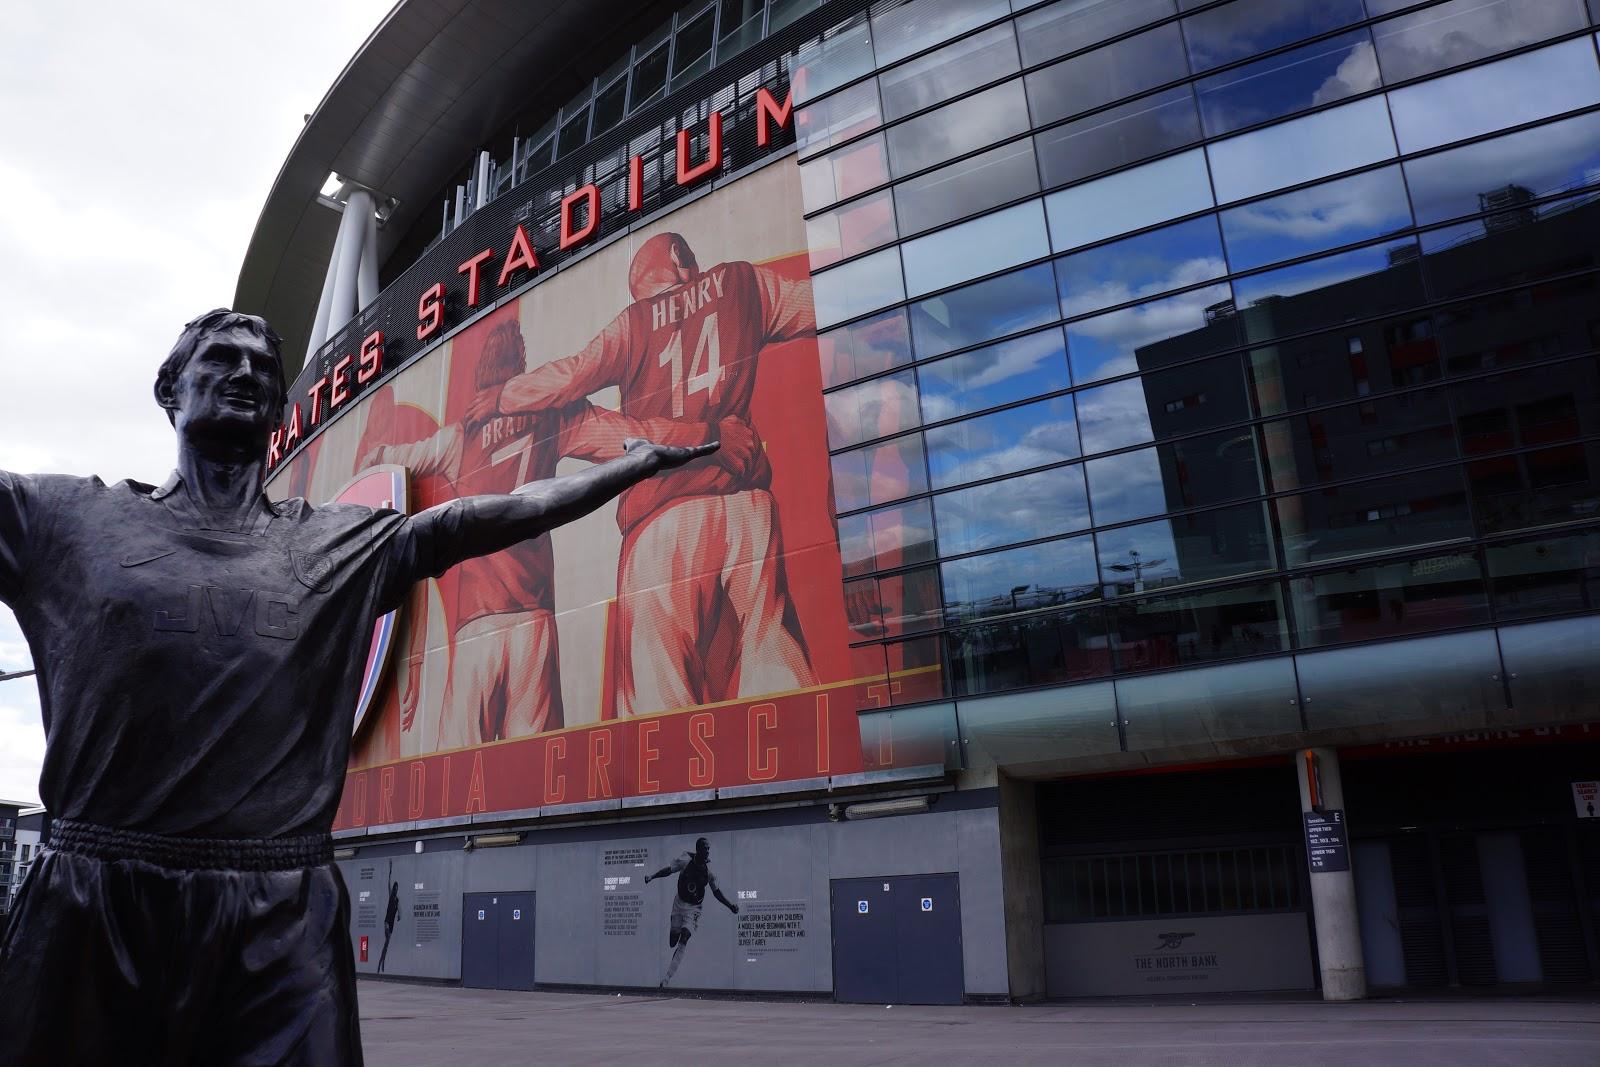 Arsenal Stadium statue outside